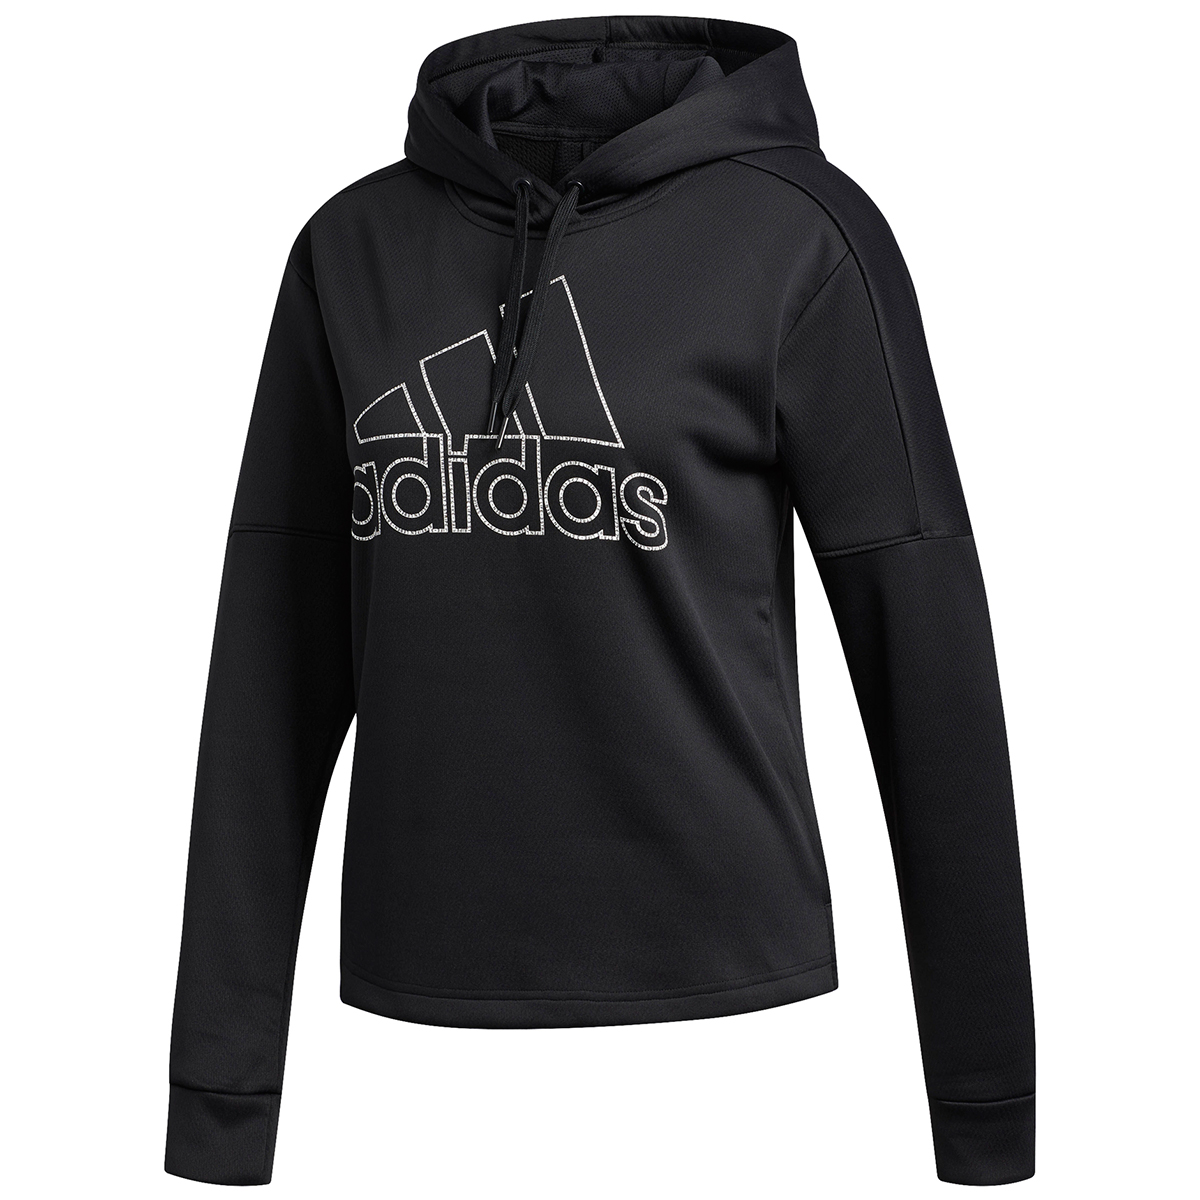 Adidas Women's Team Issue Badge Of Sport Pullover Hoodie - Black, XL